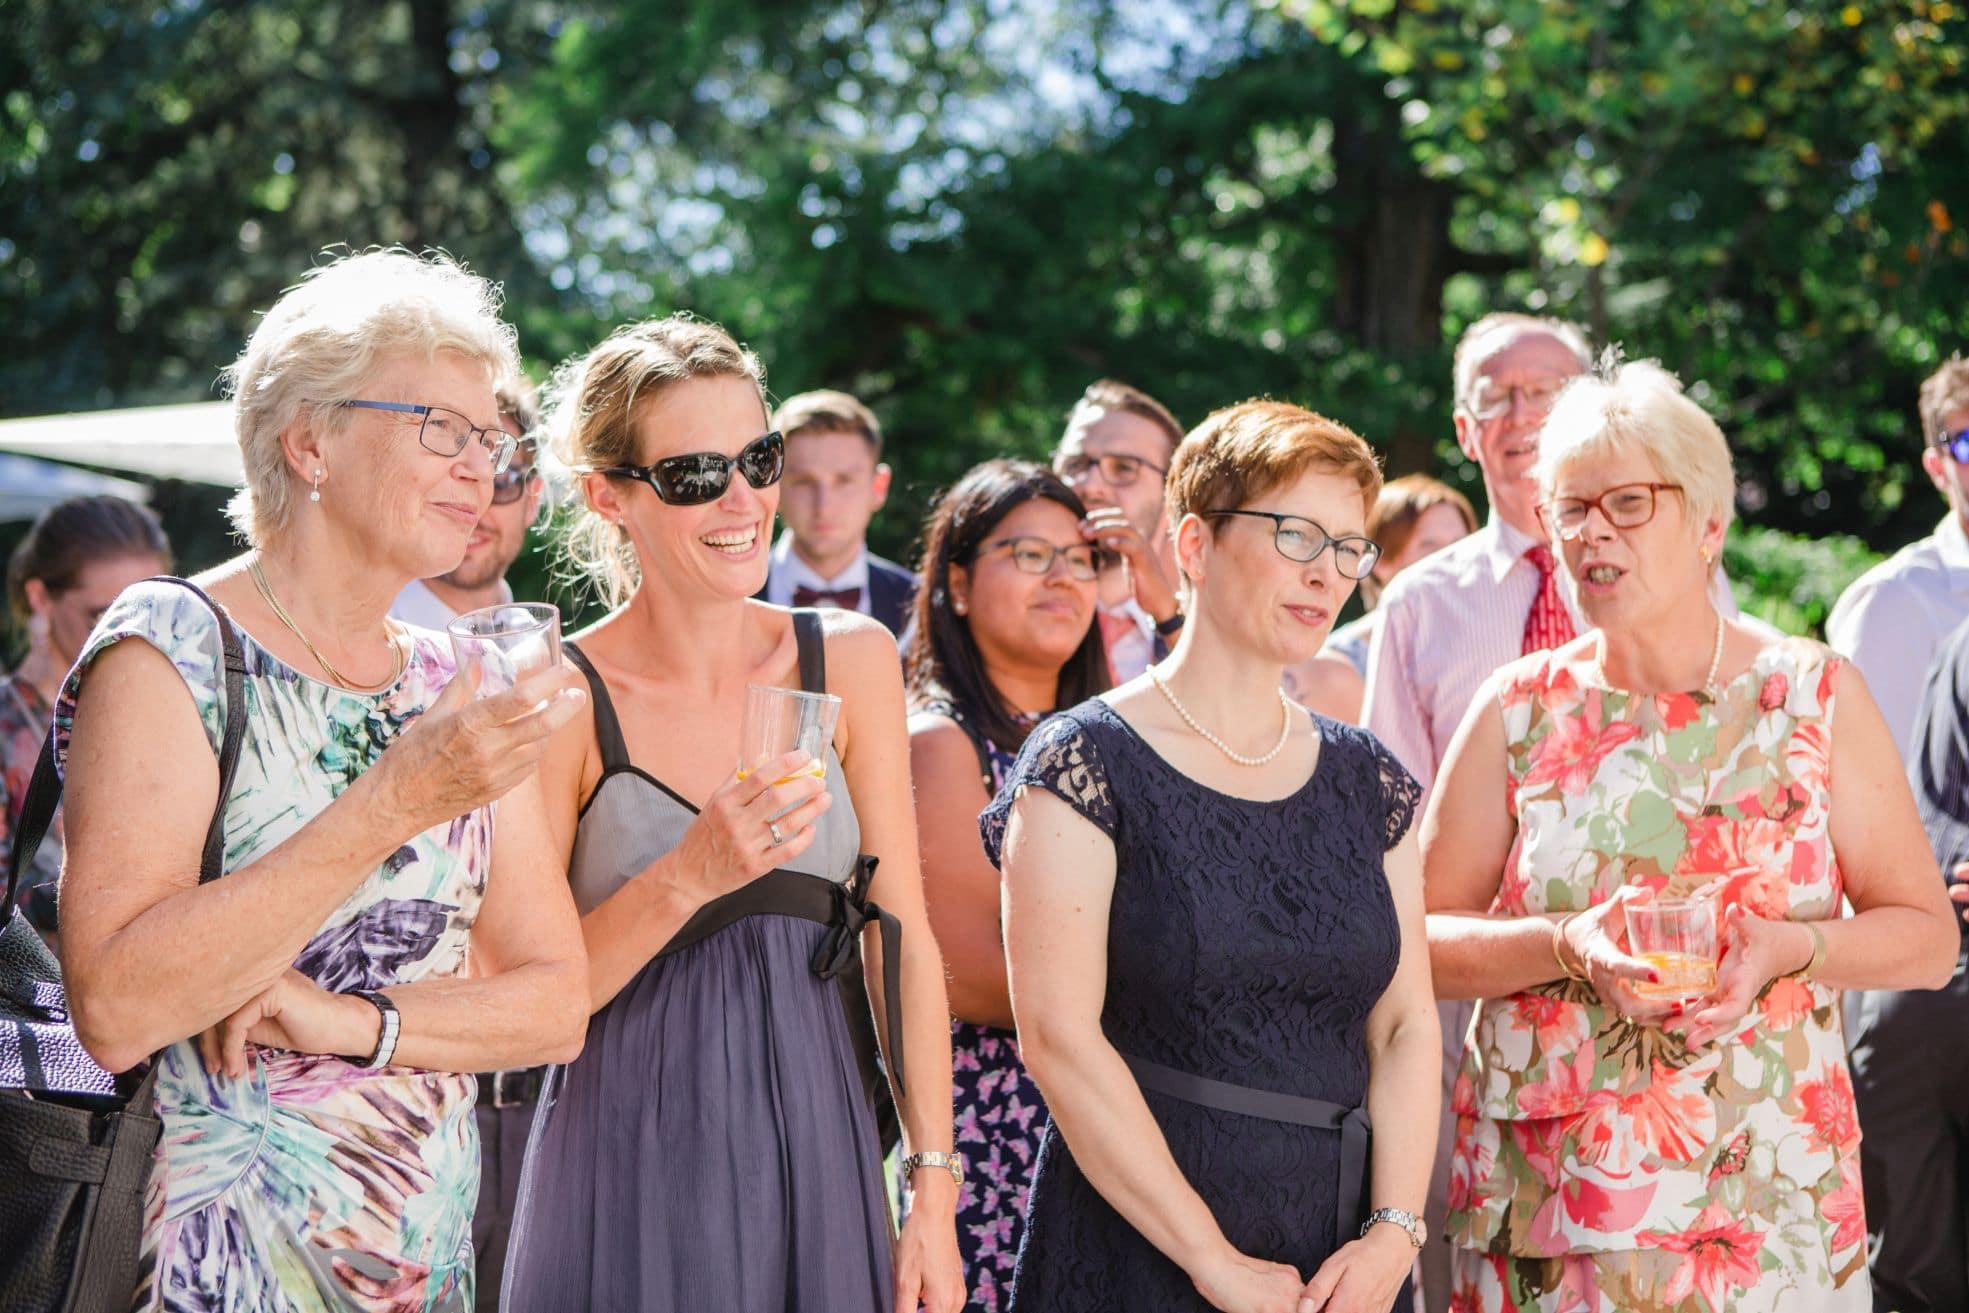 Million Memories_A&D_Hochzeitsfotograf_Schlosshochzeit_Toskana_Lago Di Como_Wedding_Tuscany_134